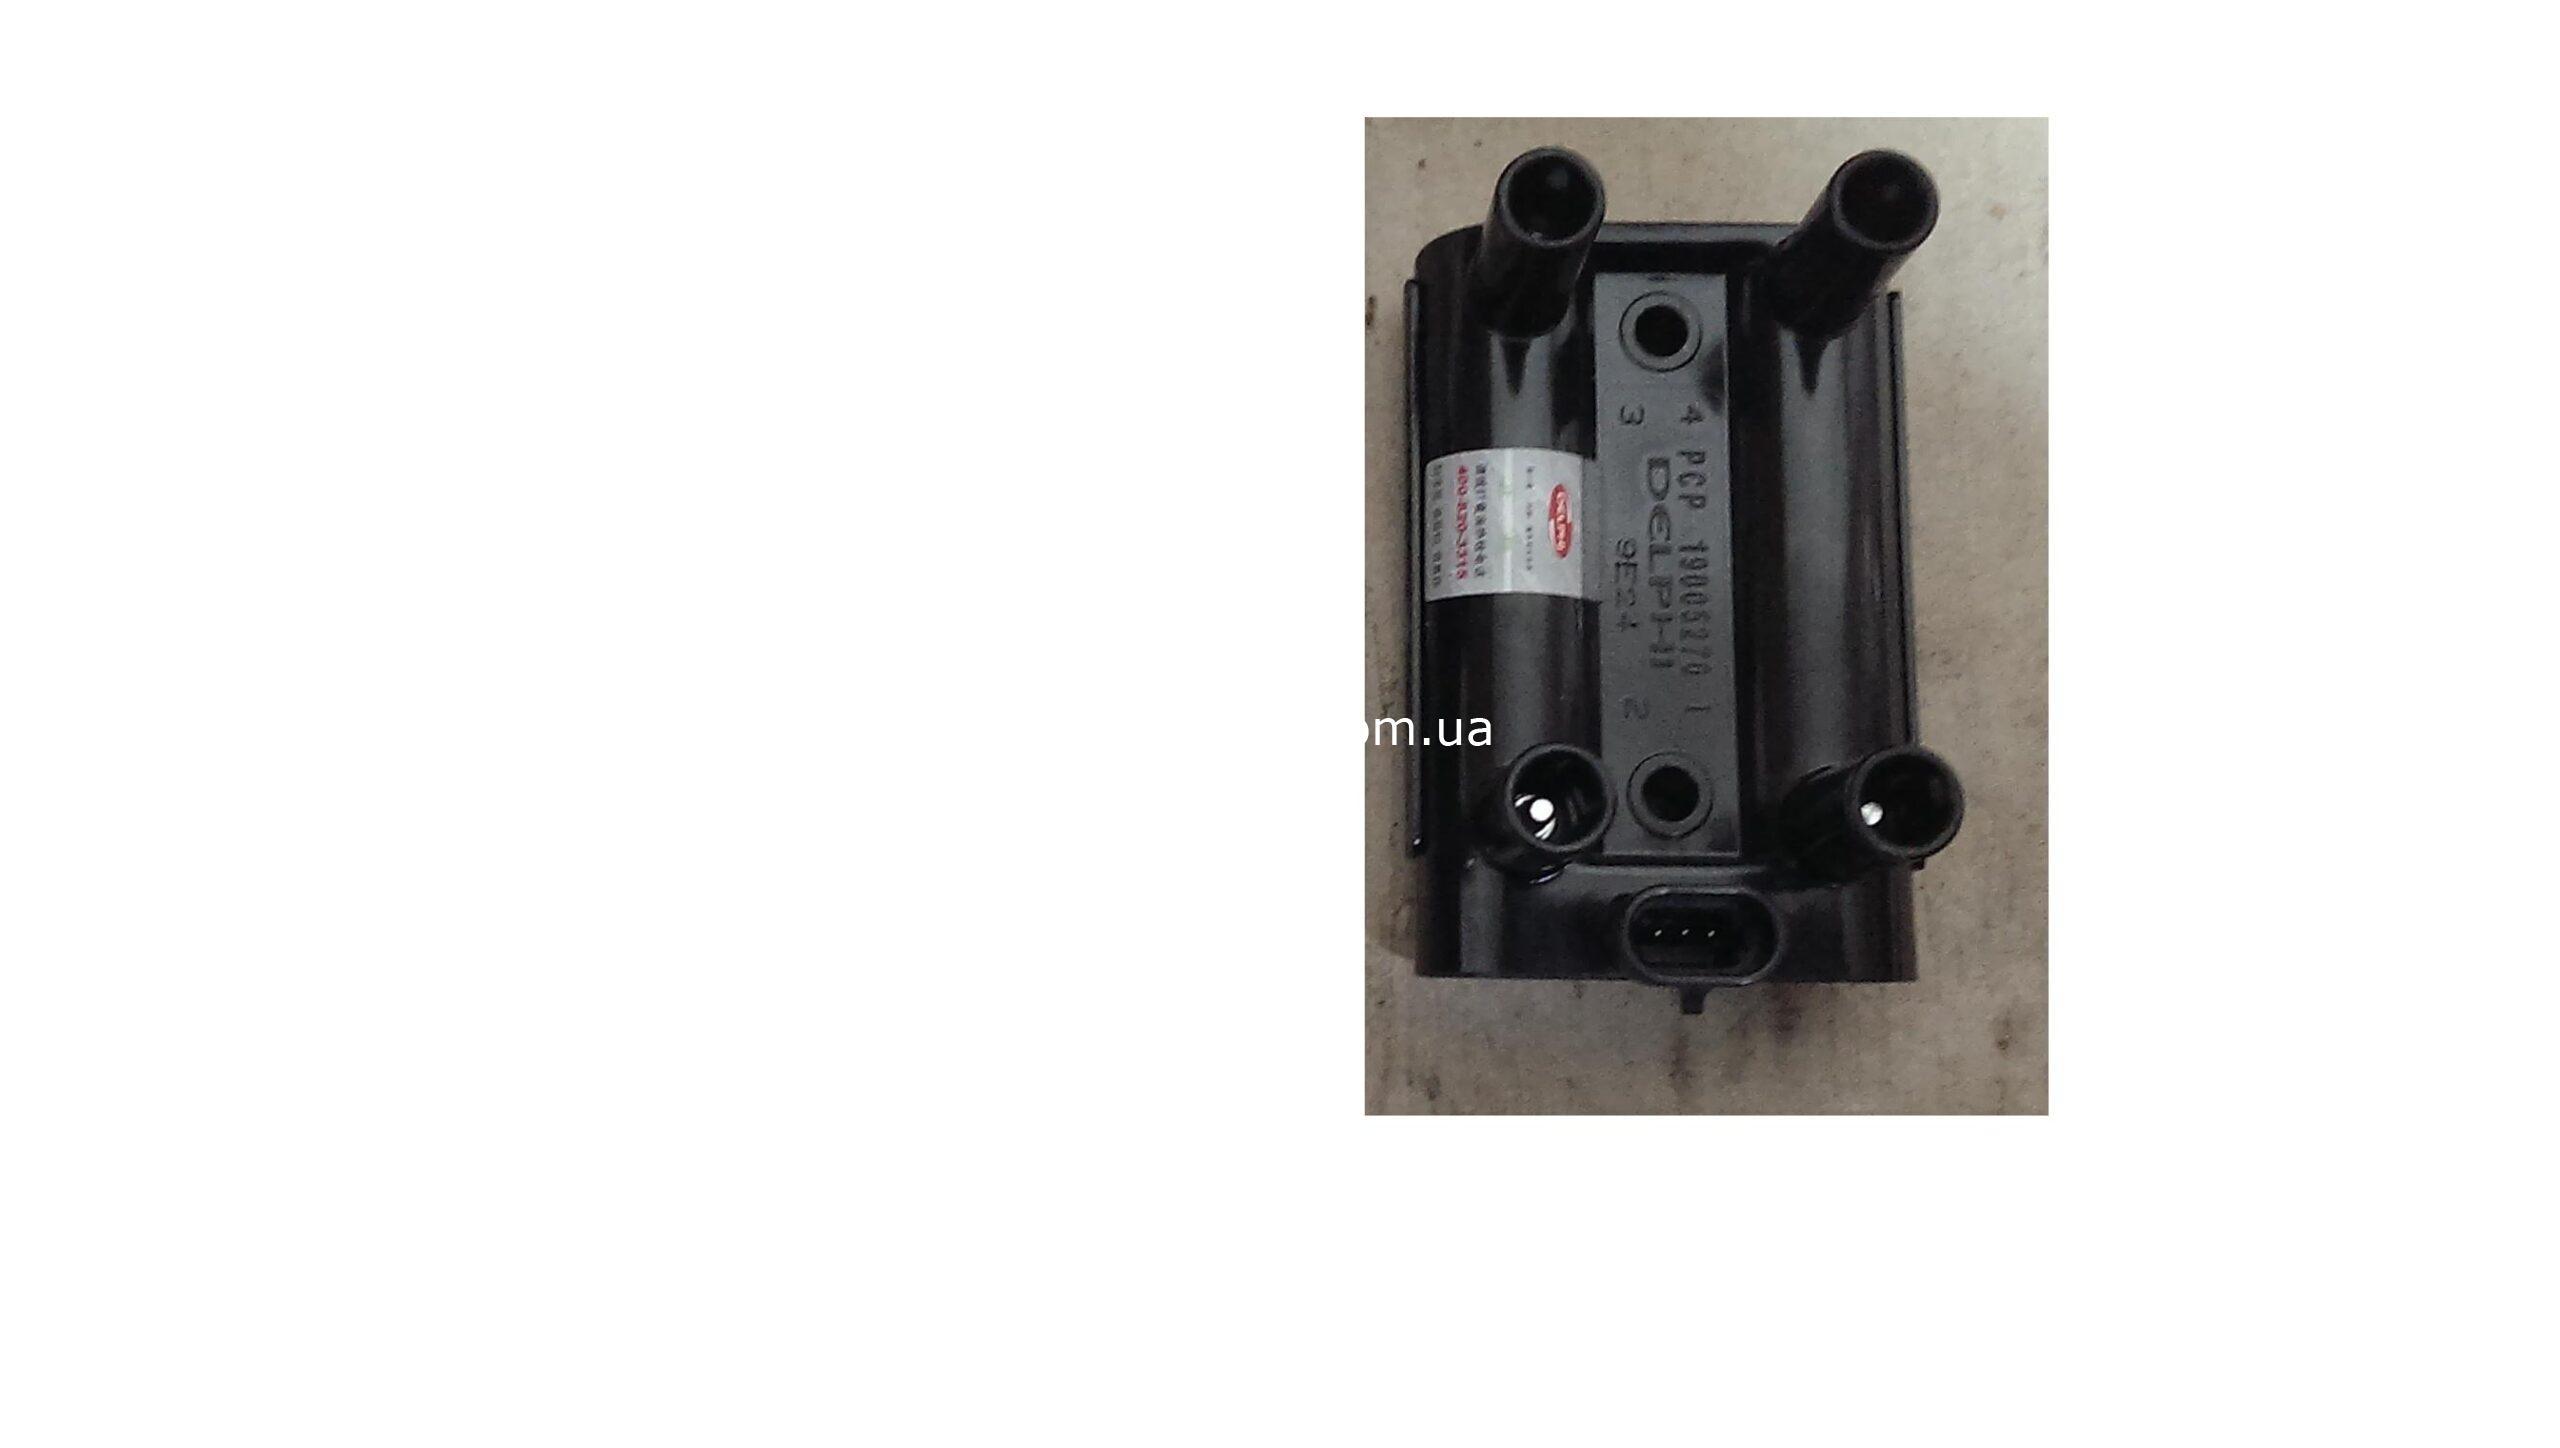 Модуль запалювання 2,2i (491Q)-ME/ модуль зажигания/ катушка зажигания-0